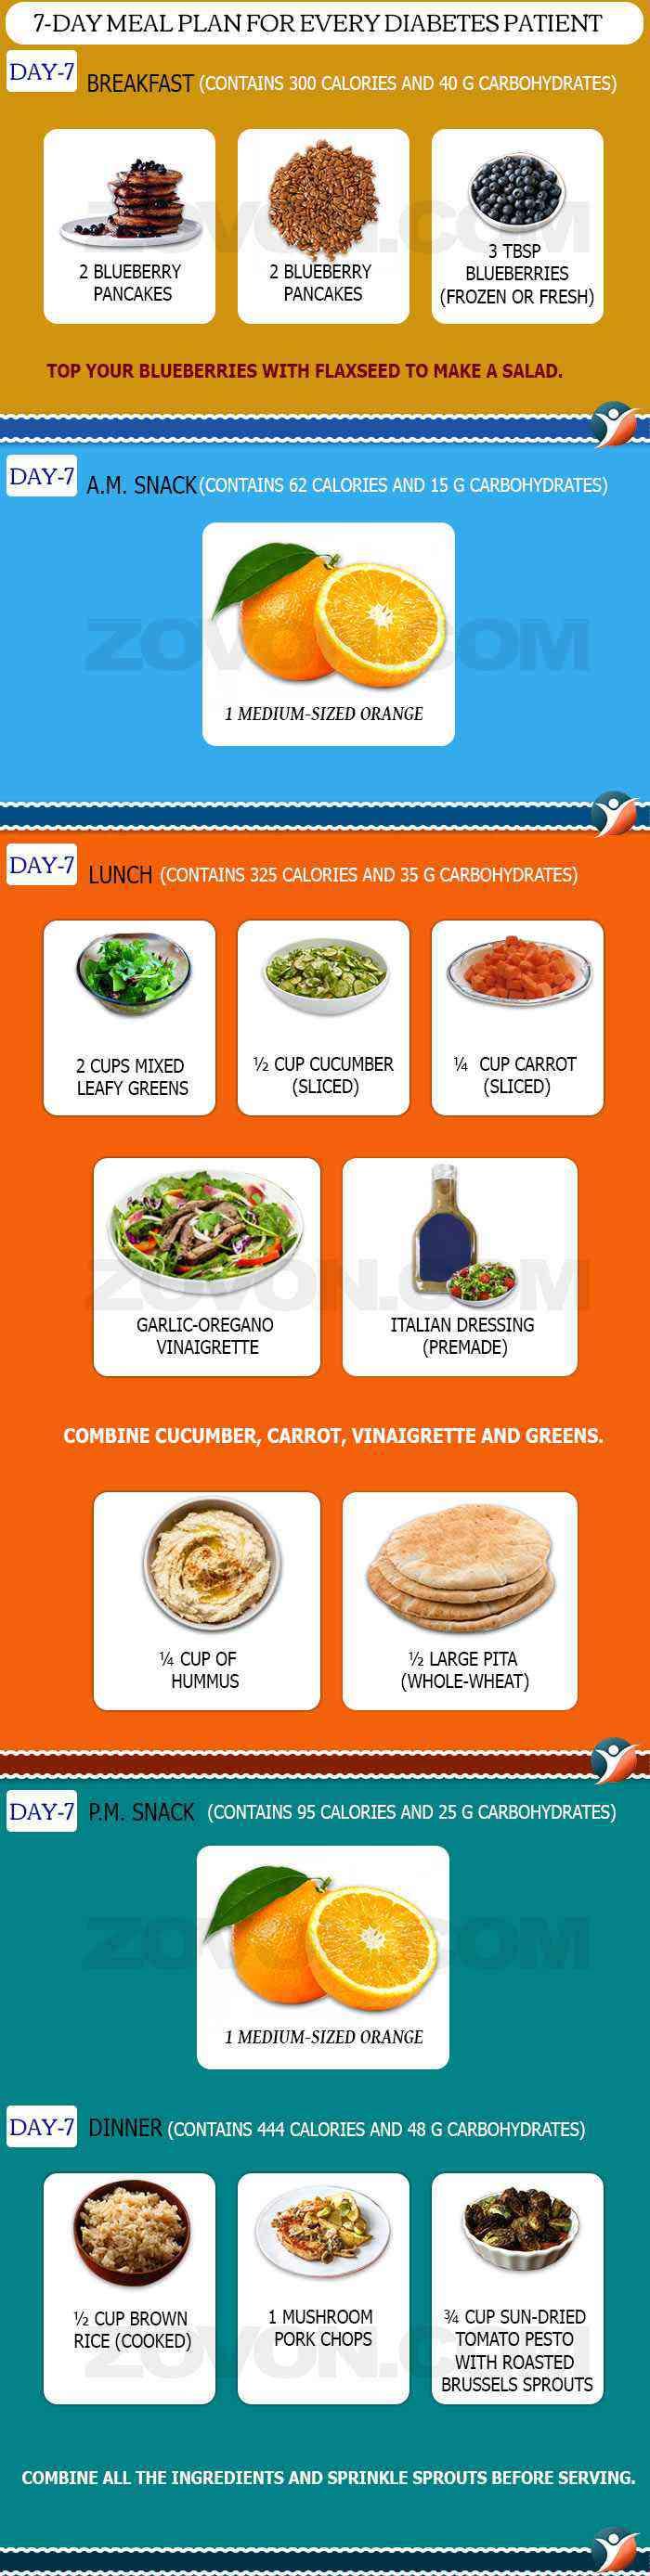 diabetes diet plan day 7